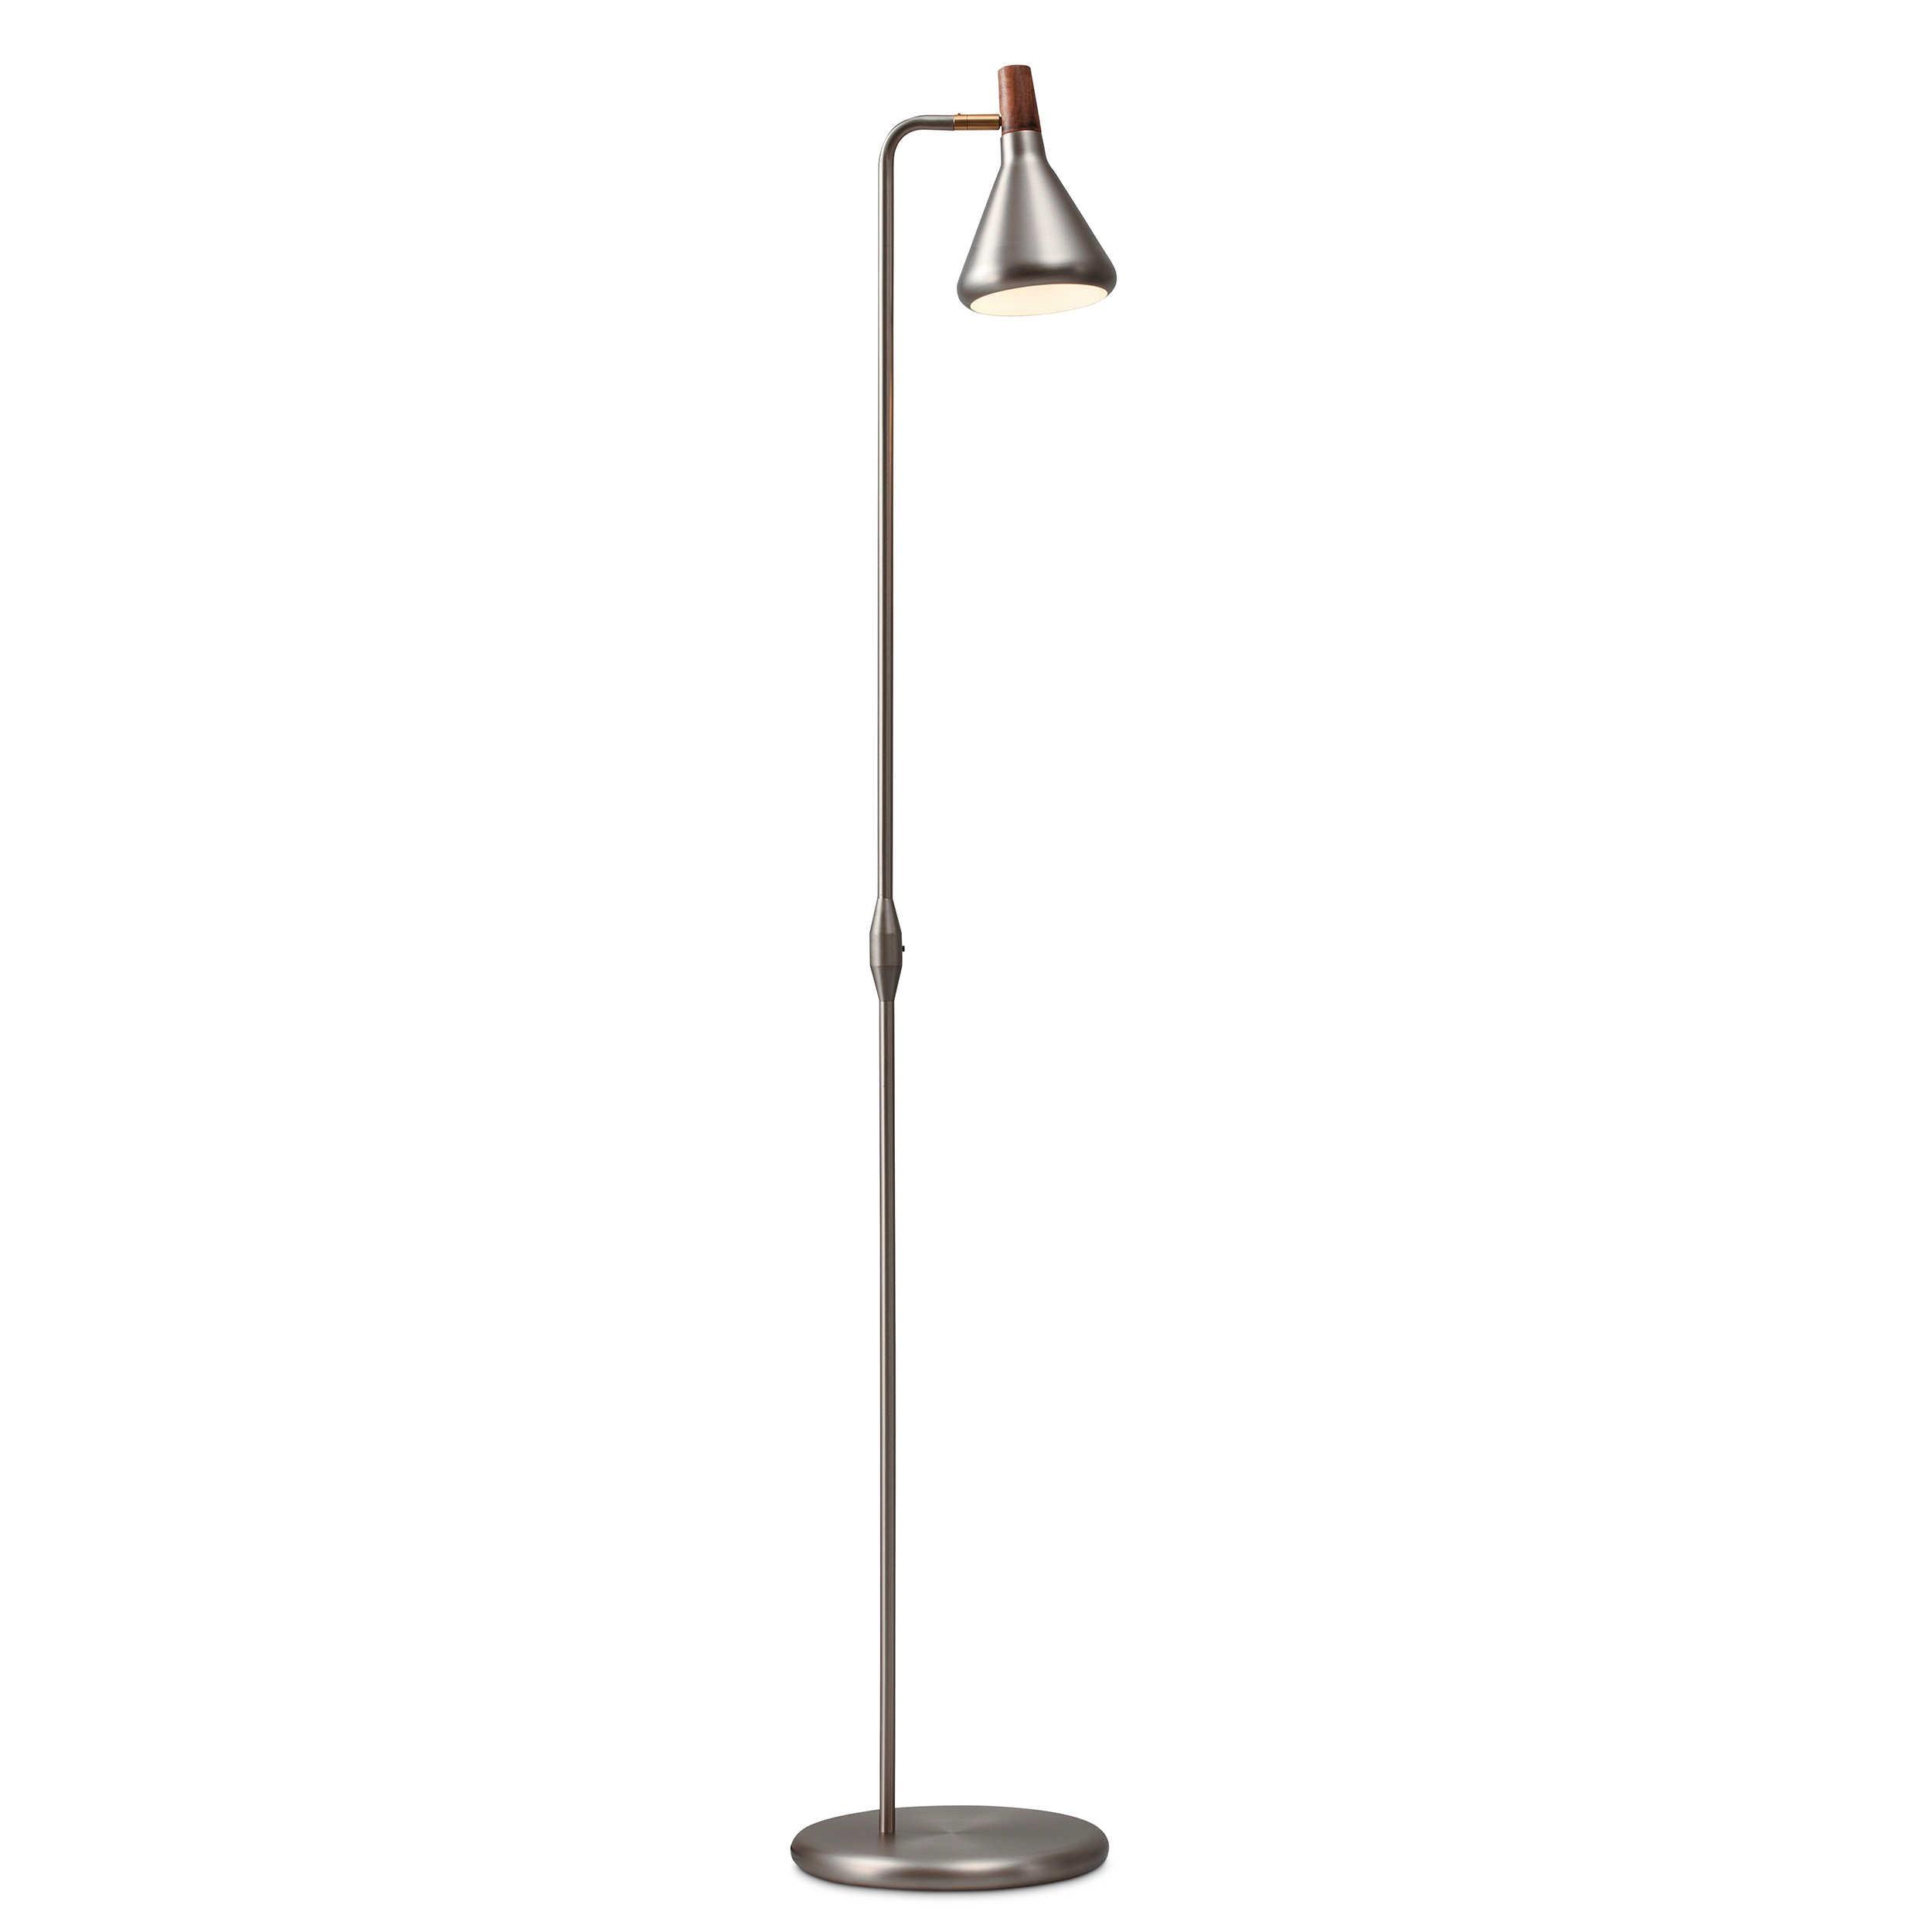 nordlux stehlampe float a silber chrom alu nickel stahl online kaufen bei woonio. Black Bedroom Furniture Sets. Home Design Ideas